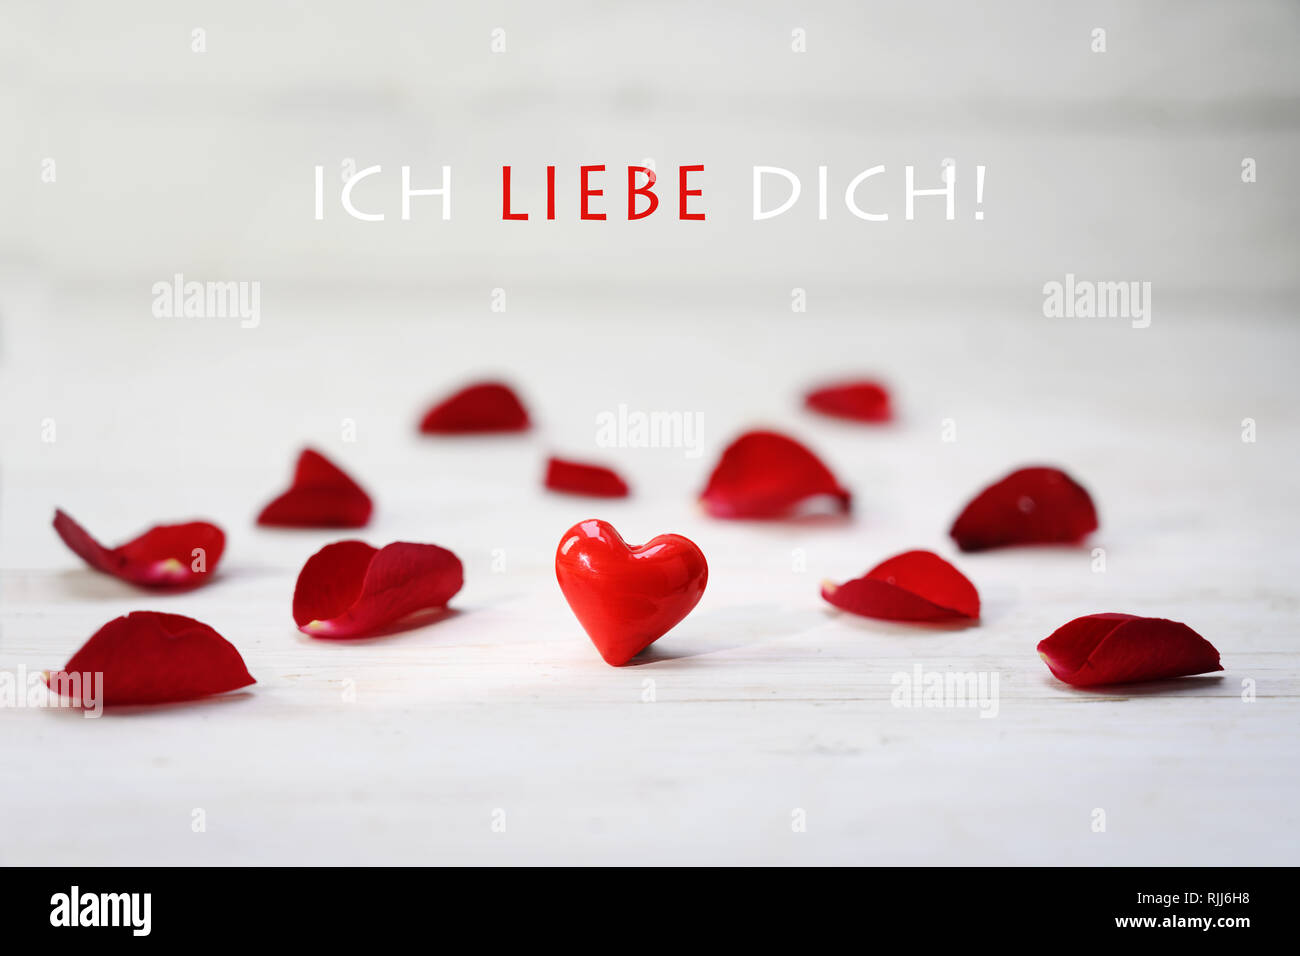 Red Glass Heart Between Rose Petals On A Light Grey Wooden